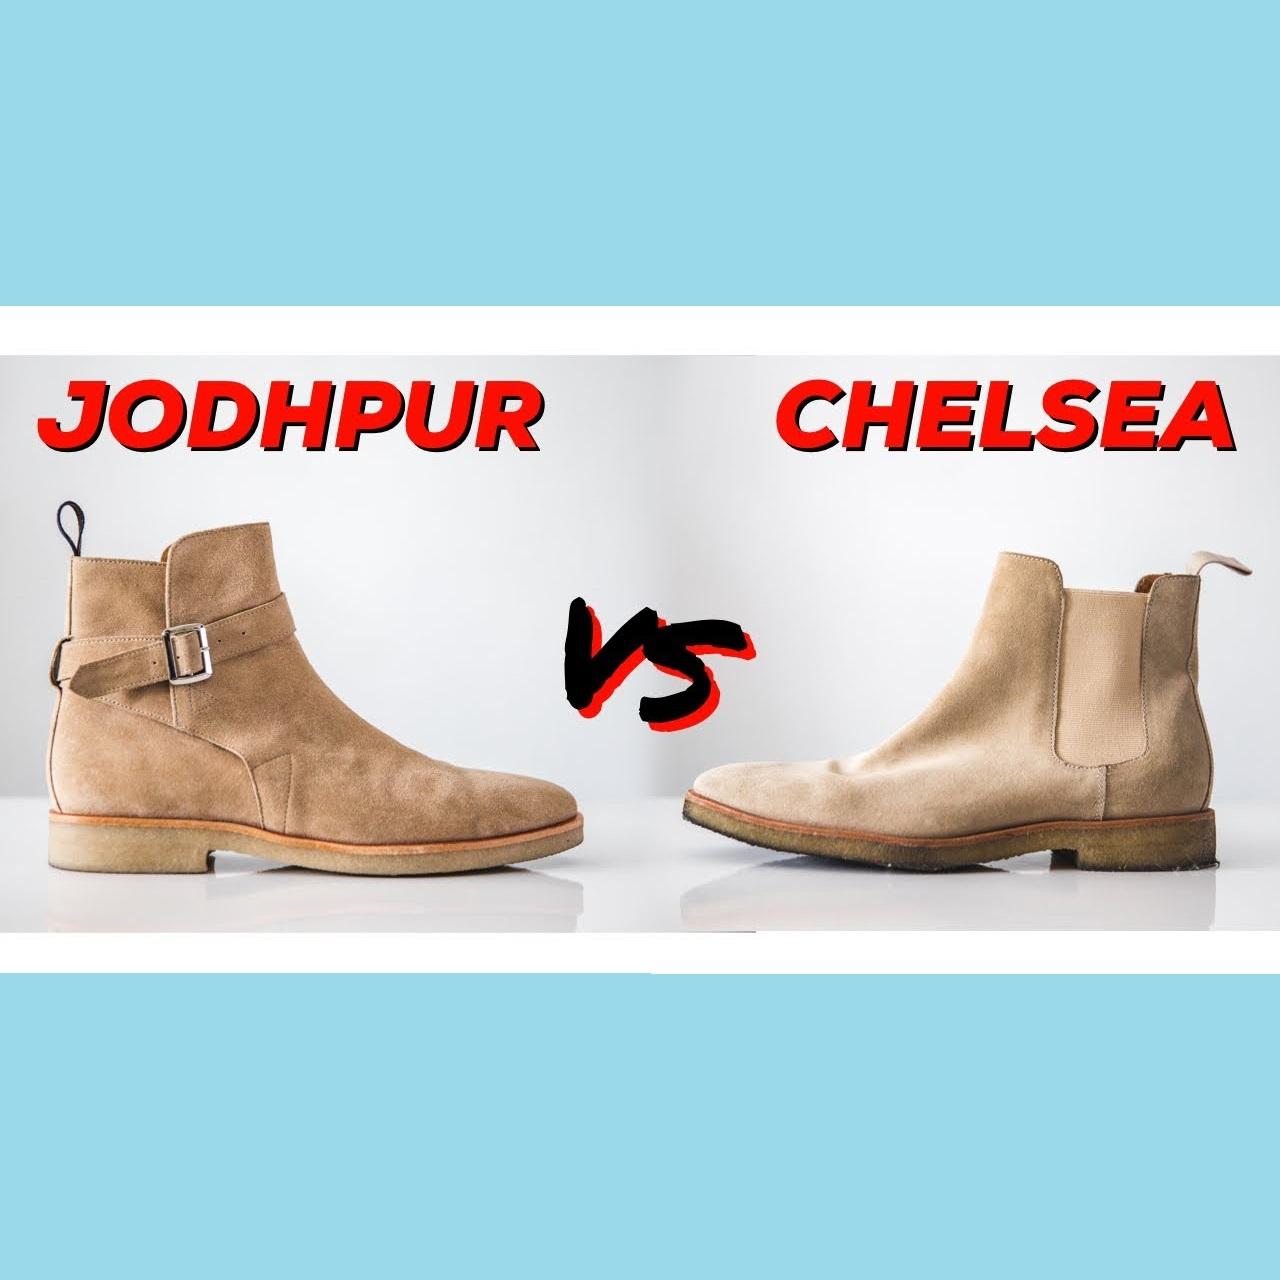 Jodhpur Boots và Chelsea Boots